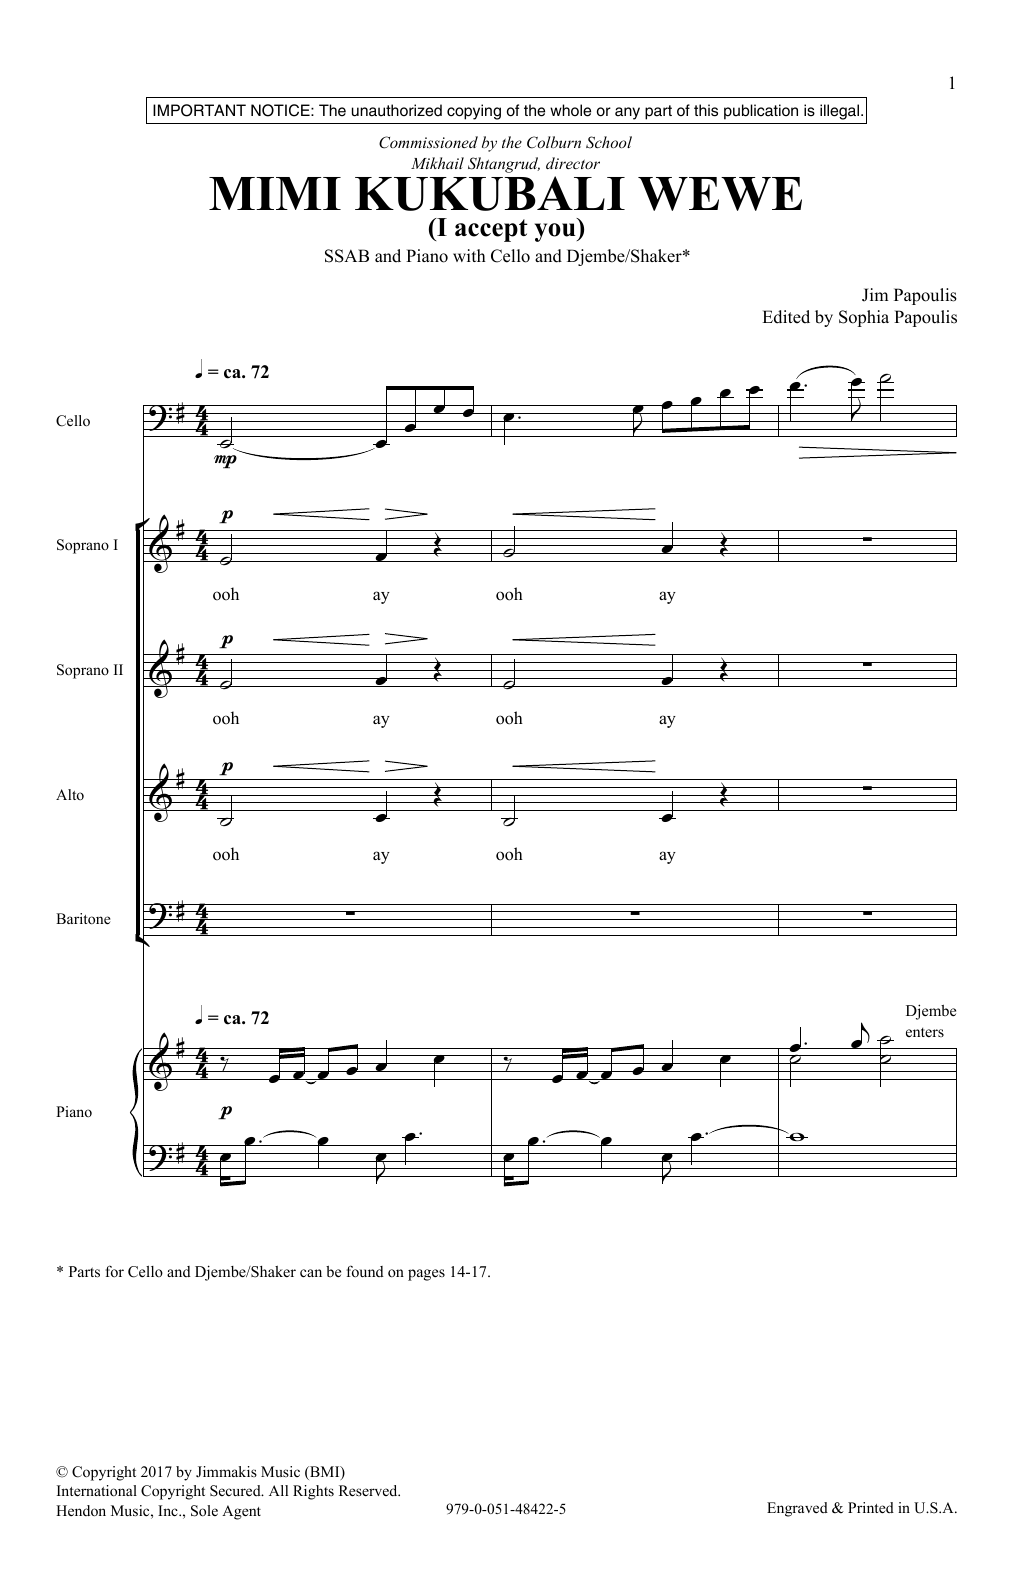 Mimi Kukubali Wewe - SSAB - Sounds of a Better World Series by Jim Papoulis